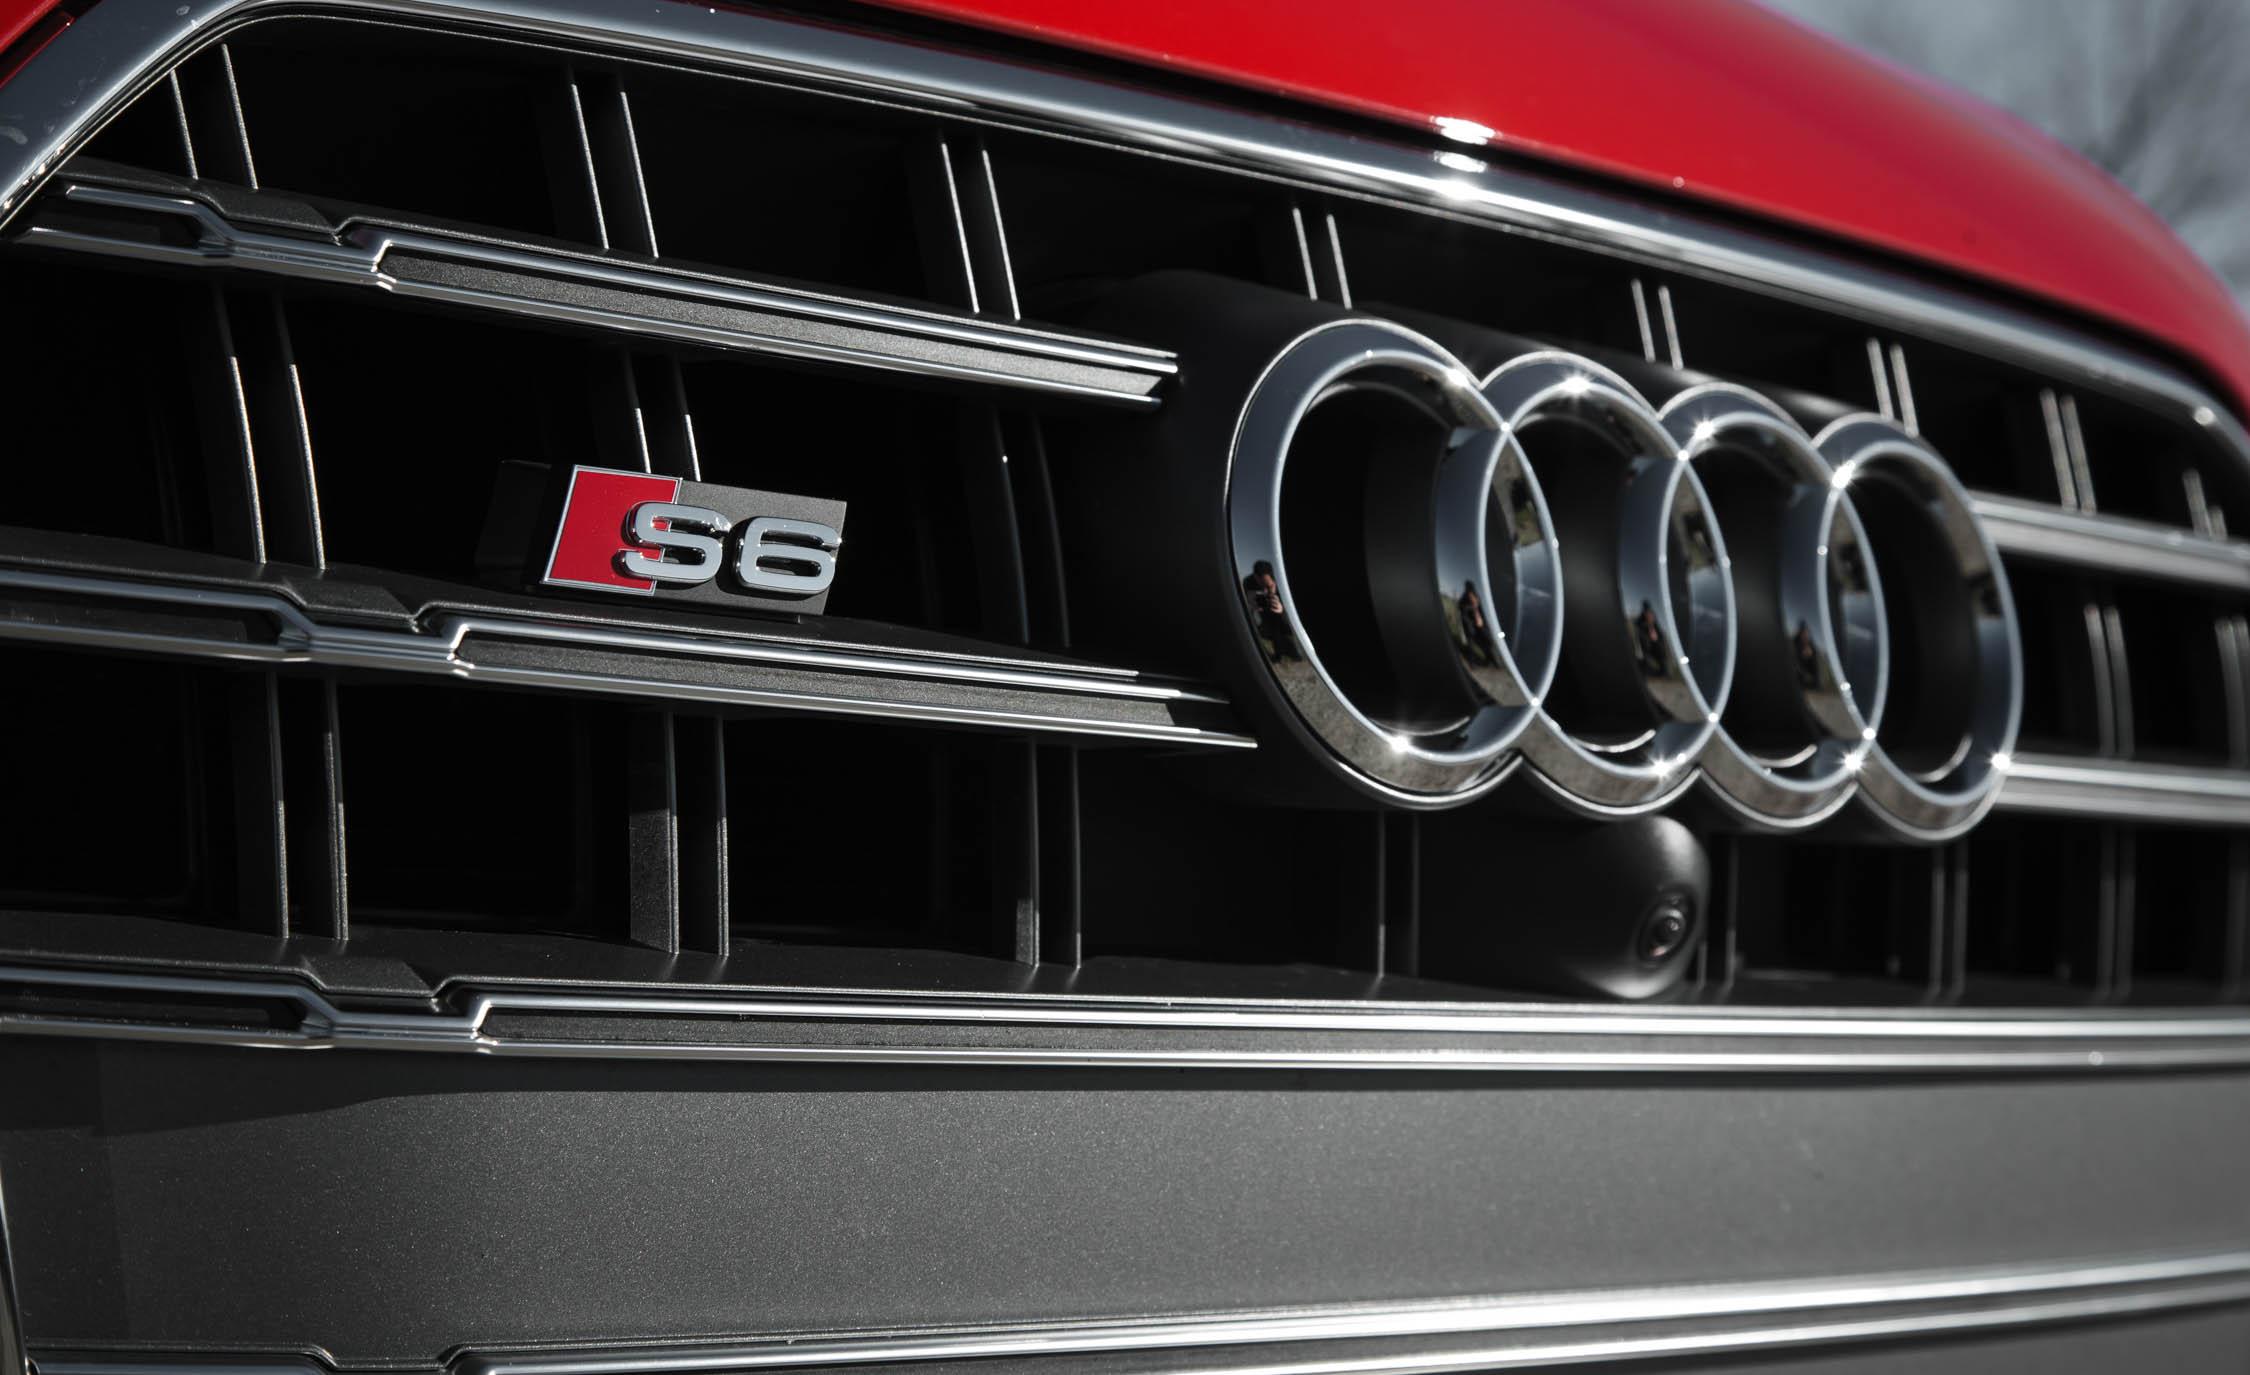 2016 Audi S6 Exterior Badge Front